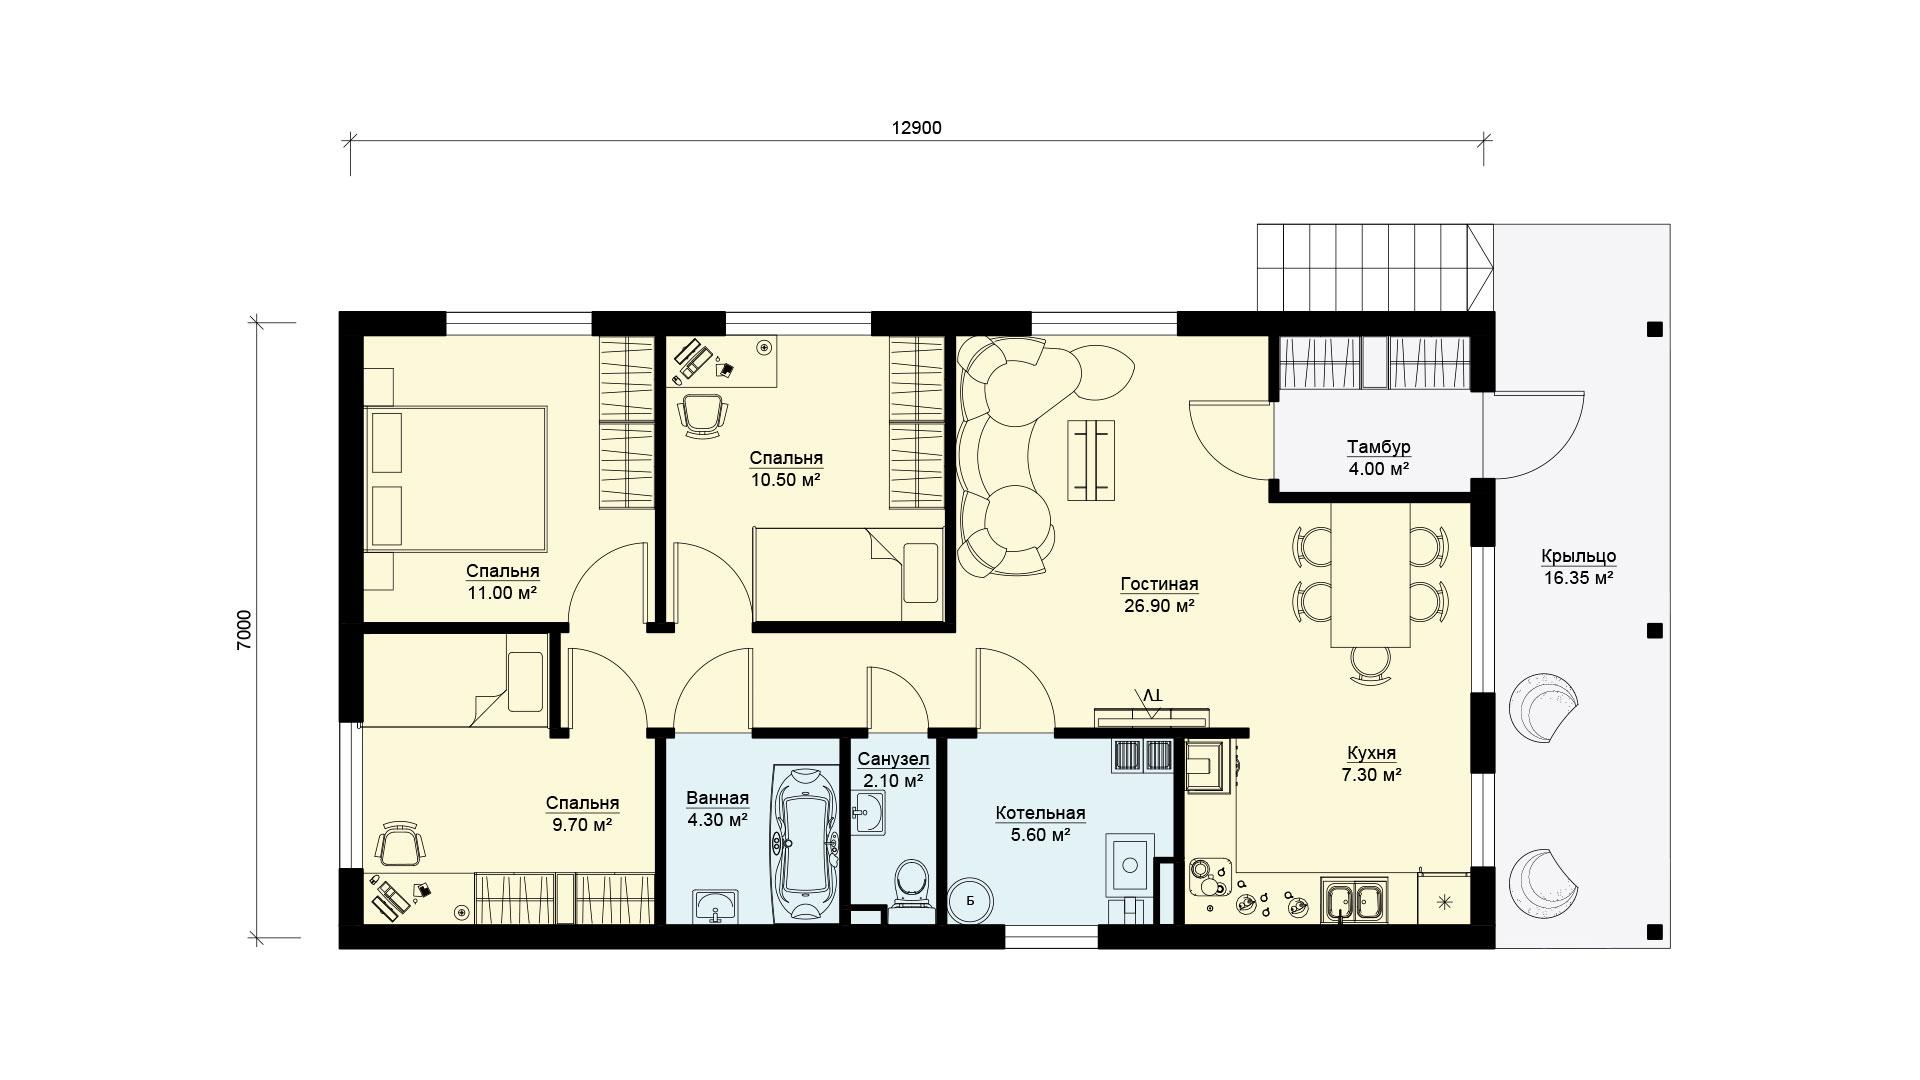 Планировка дома 13 на 7 одноэтажного, проект БЭНПАН БП-94.